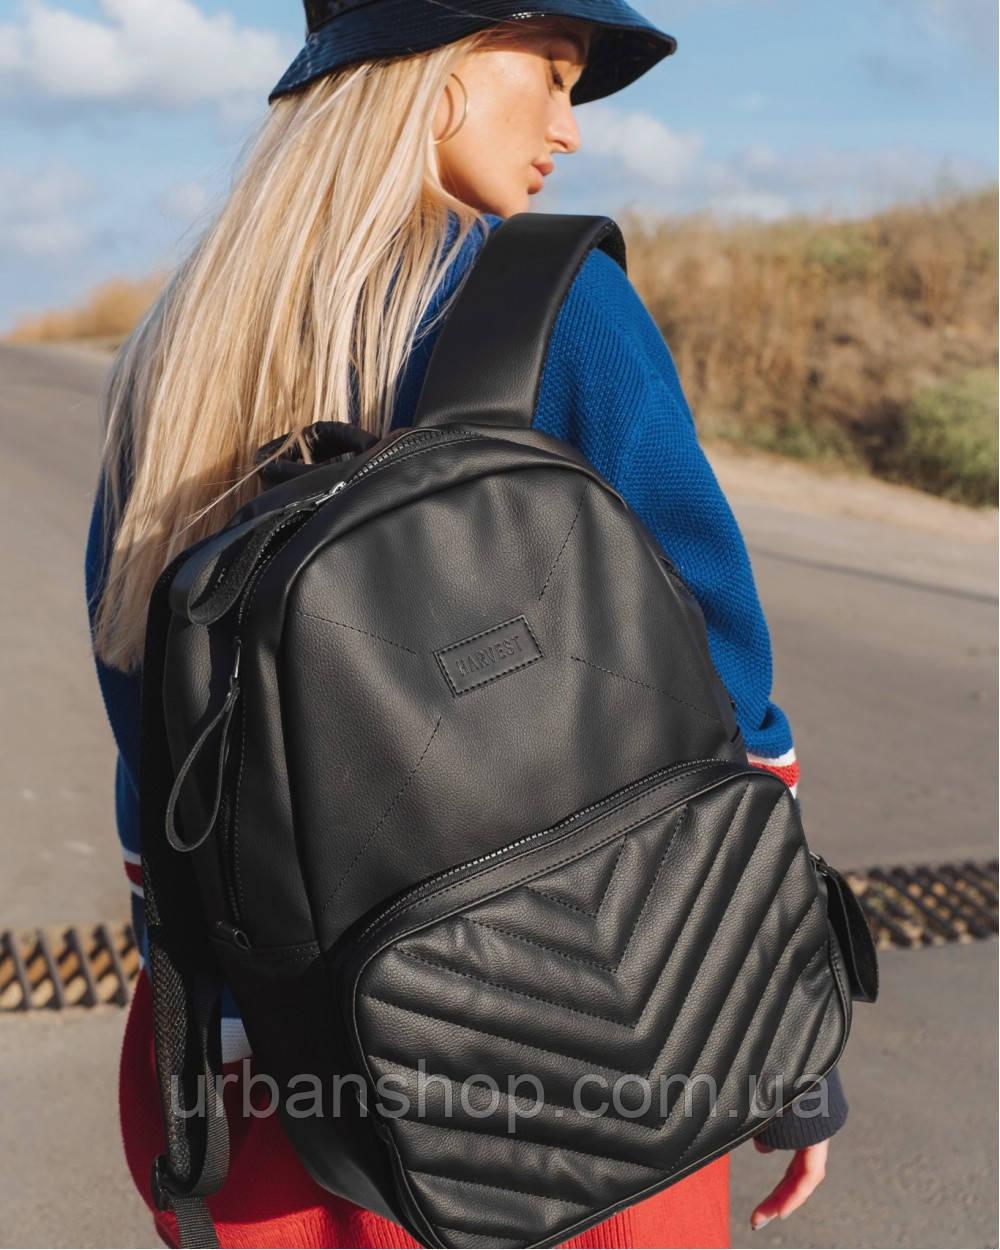 Рюкзак Harvest сумка універсальна BERRY LARGE ЧОРНИЙ (НОУТБУК 15,6)